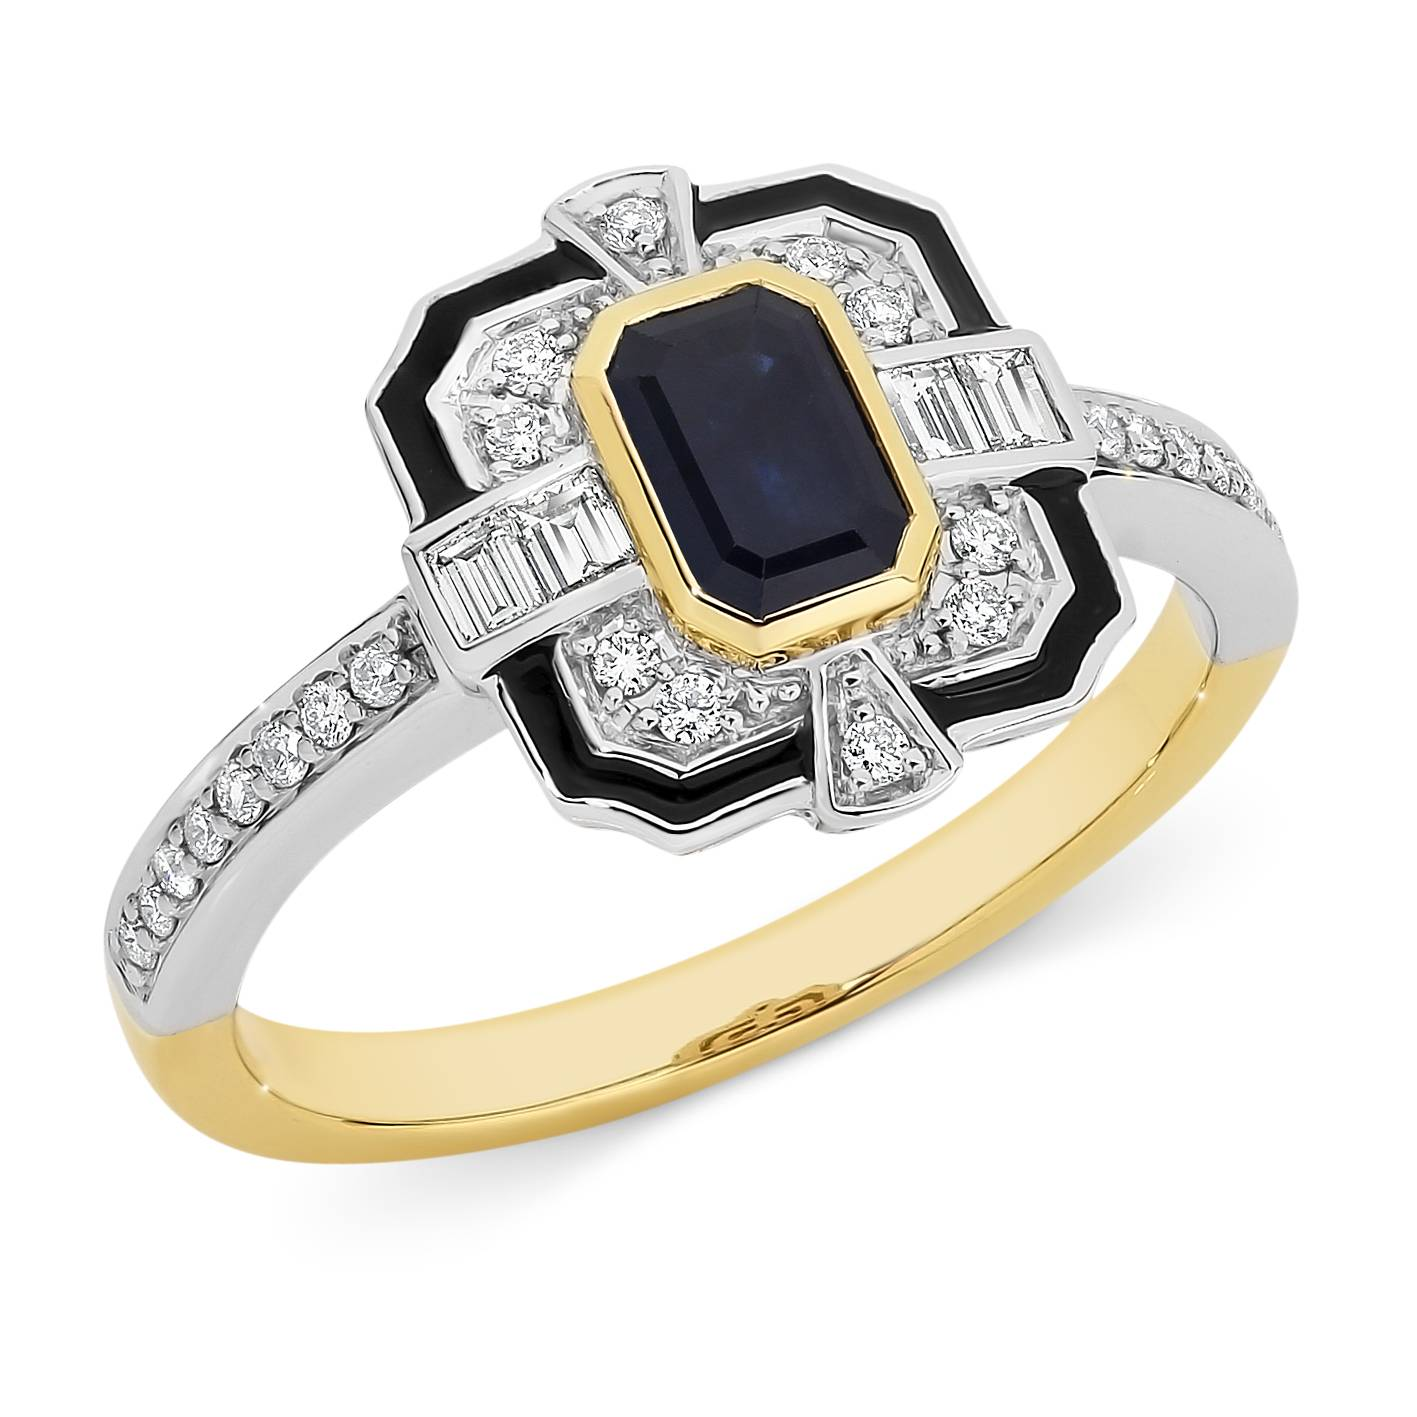 Emerald cut sapphire & diamond ring - Andrew Mazzone ... - photo#22